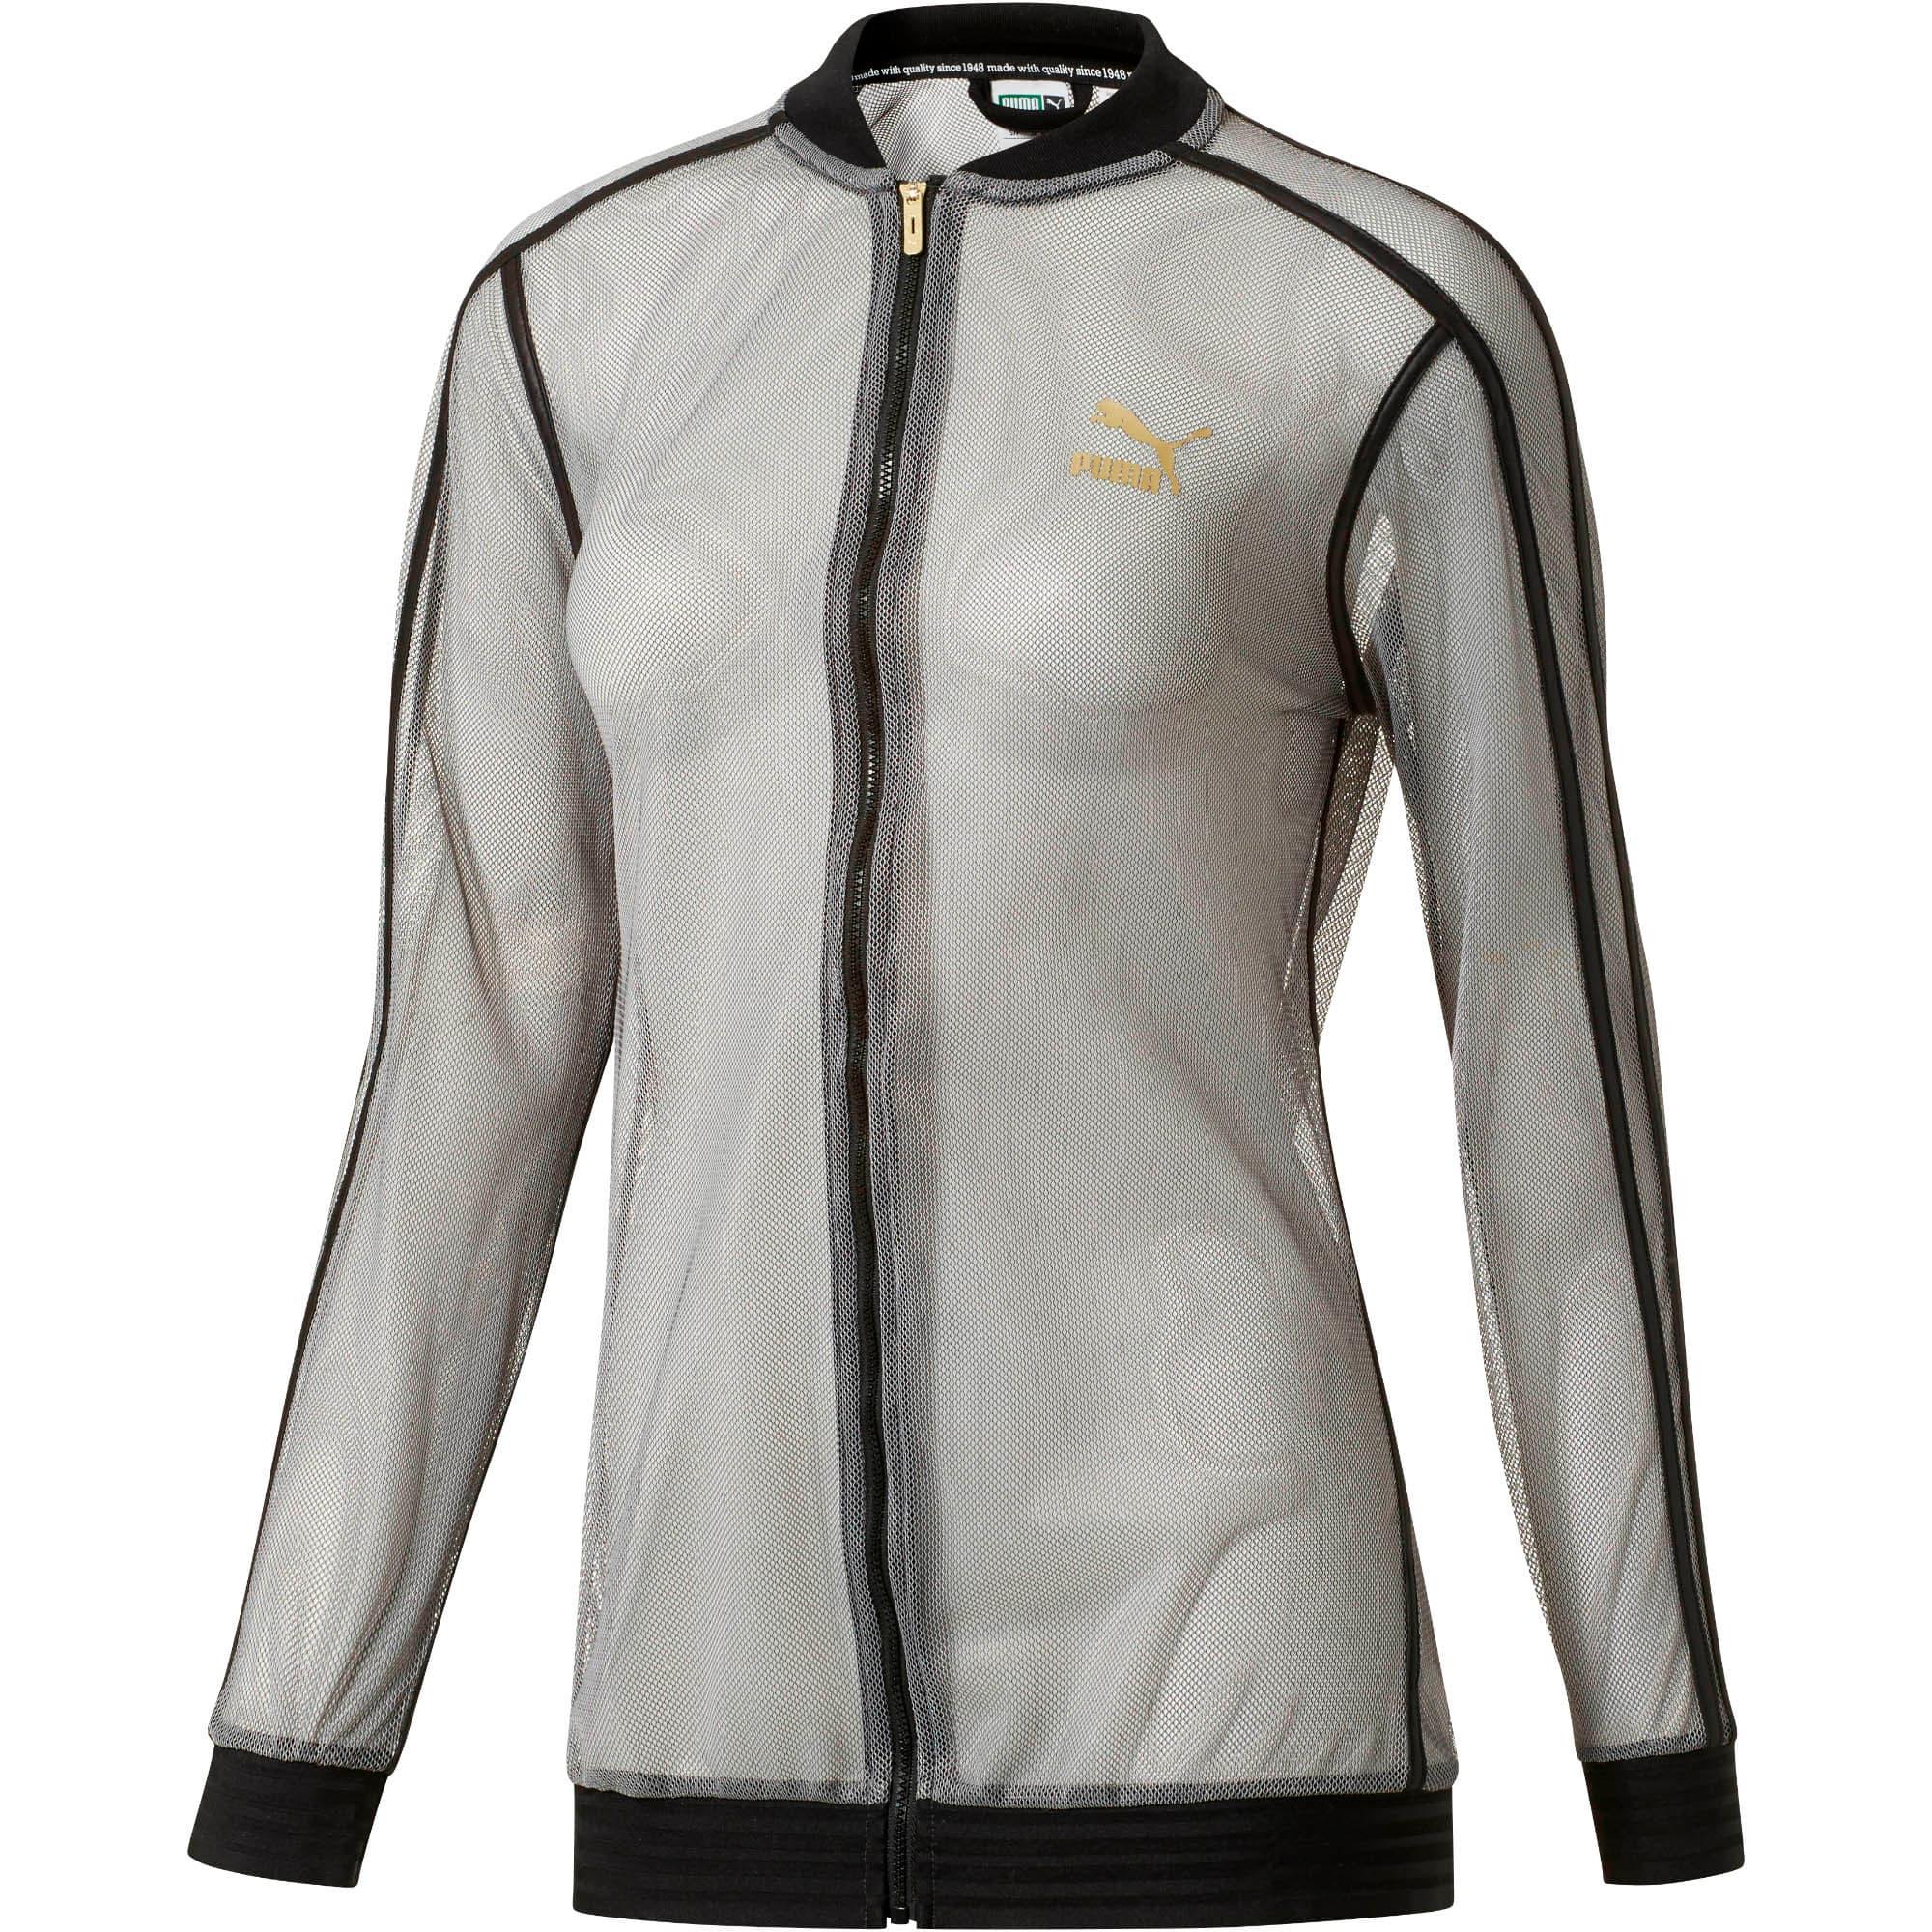 Thumbnail 1 of Fashion T7 Jacket, Puma Black, medium